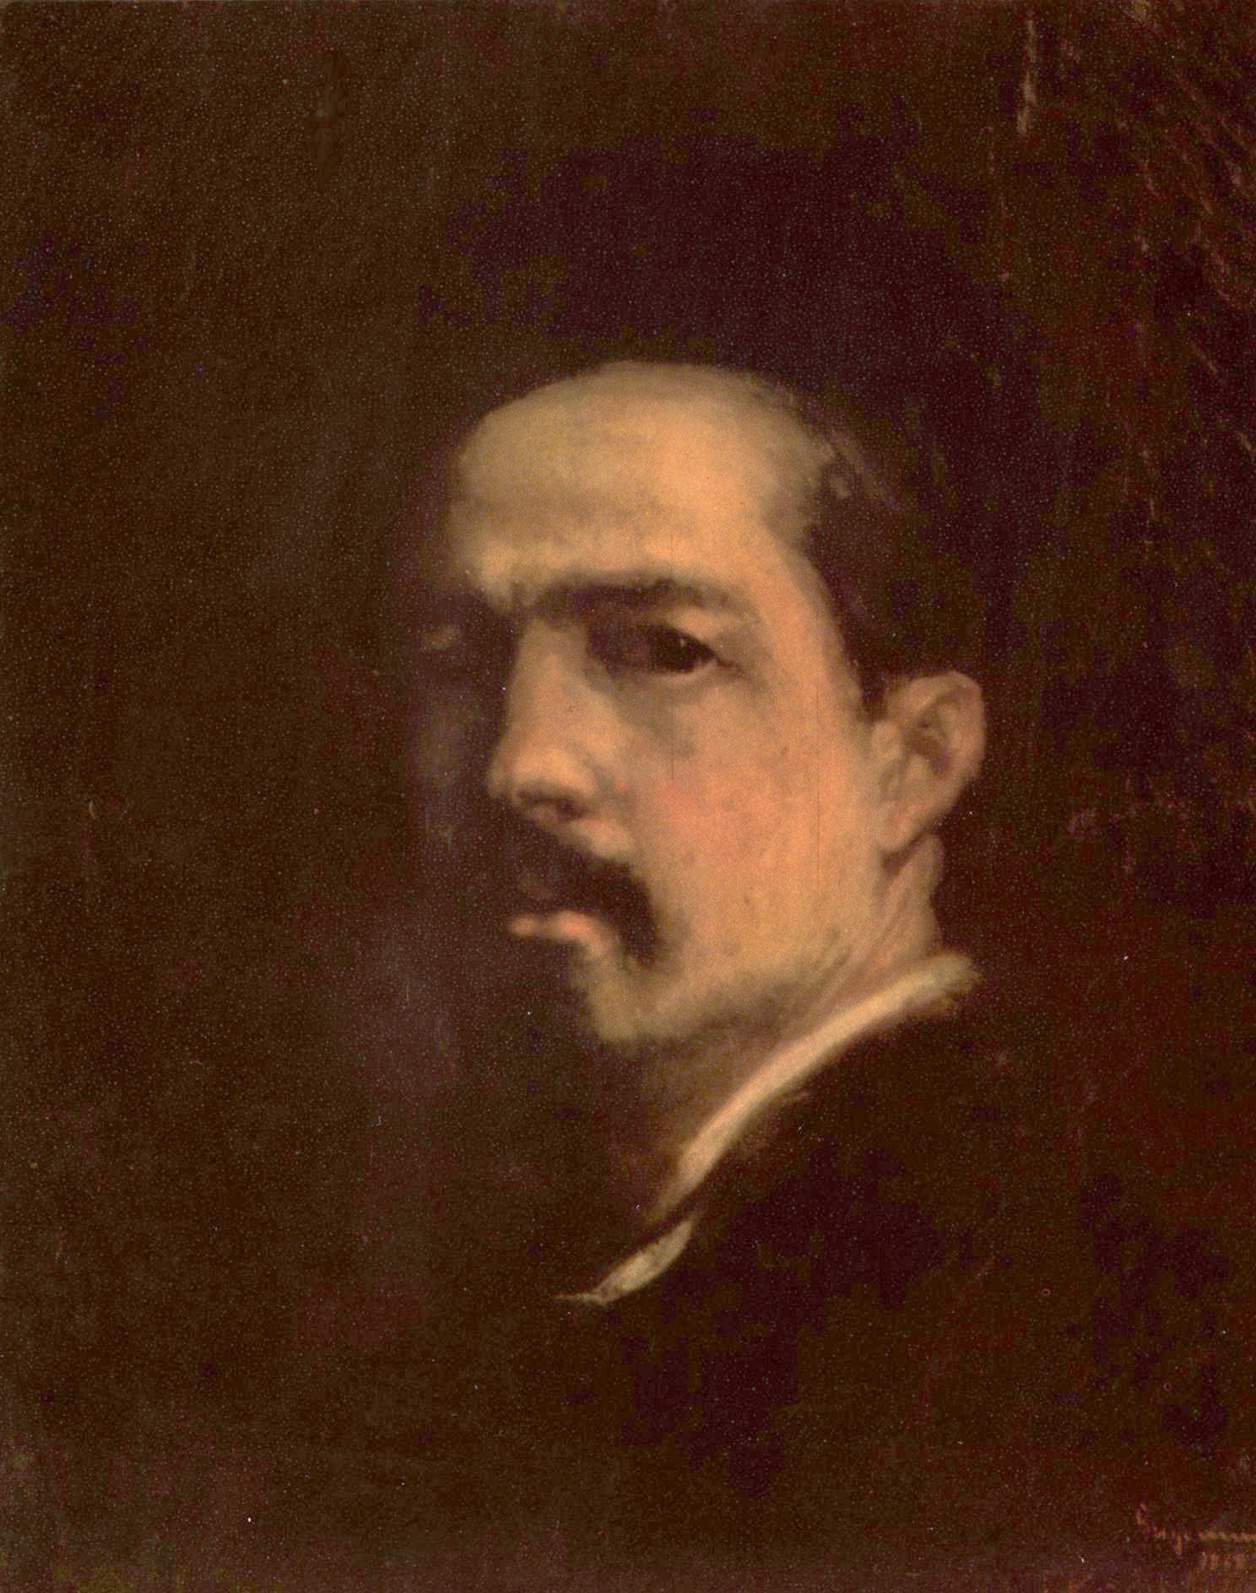 Autoportret (pictură de Nicolae Grigorescu) - Wikipedia